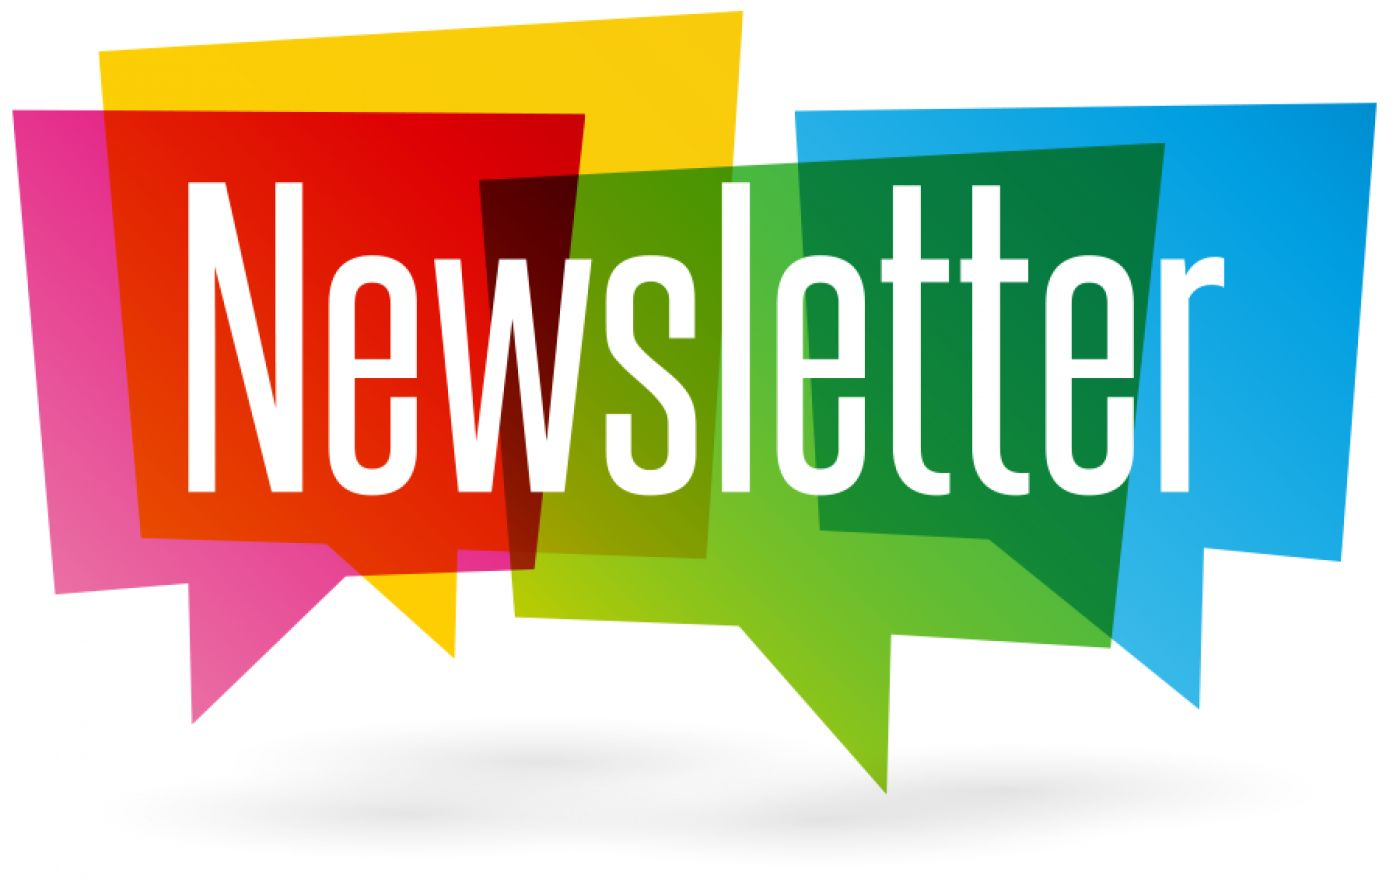 Newsletter - Downtown Grass Valley